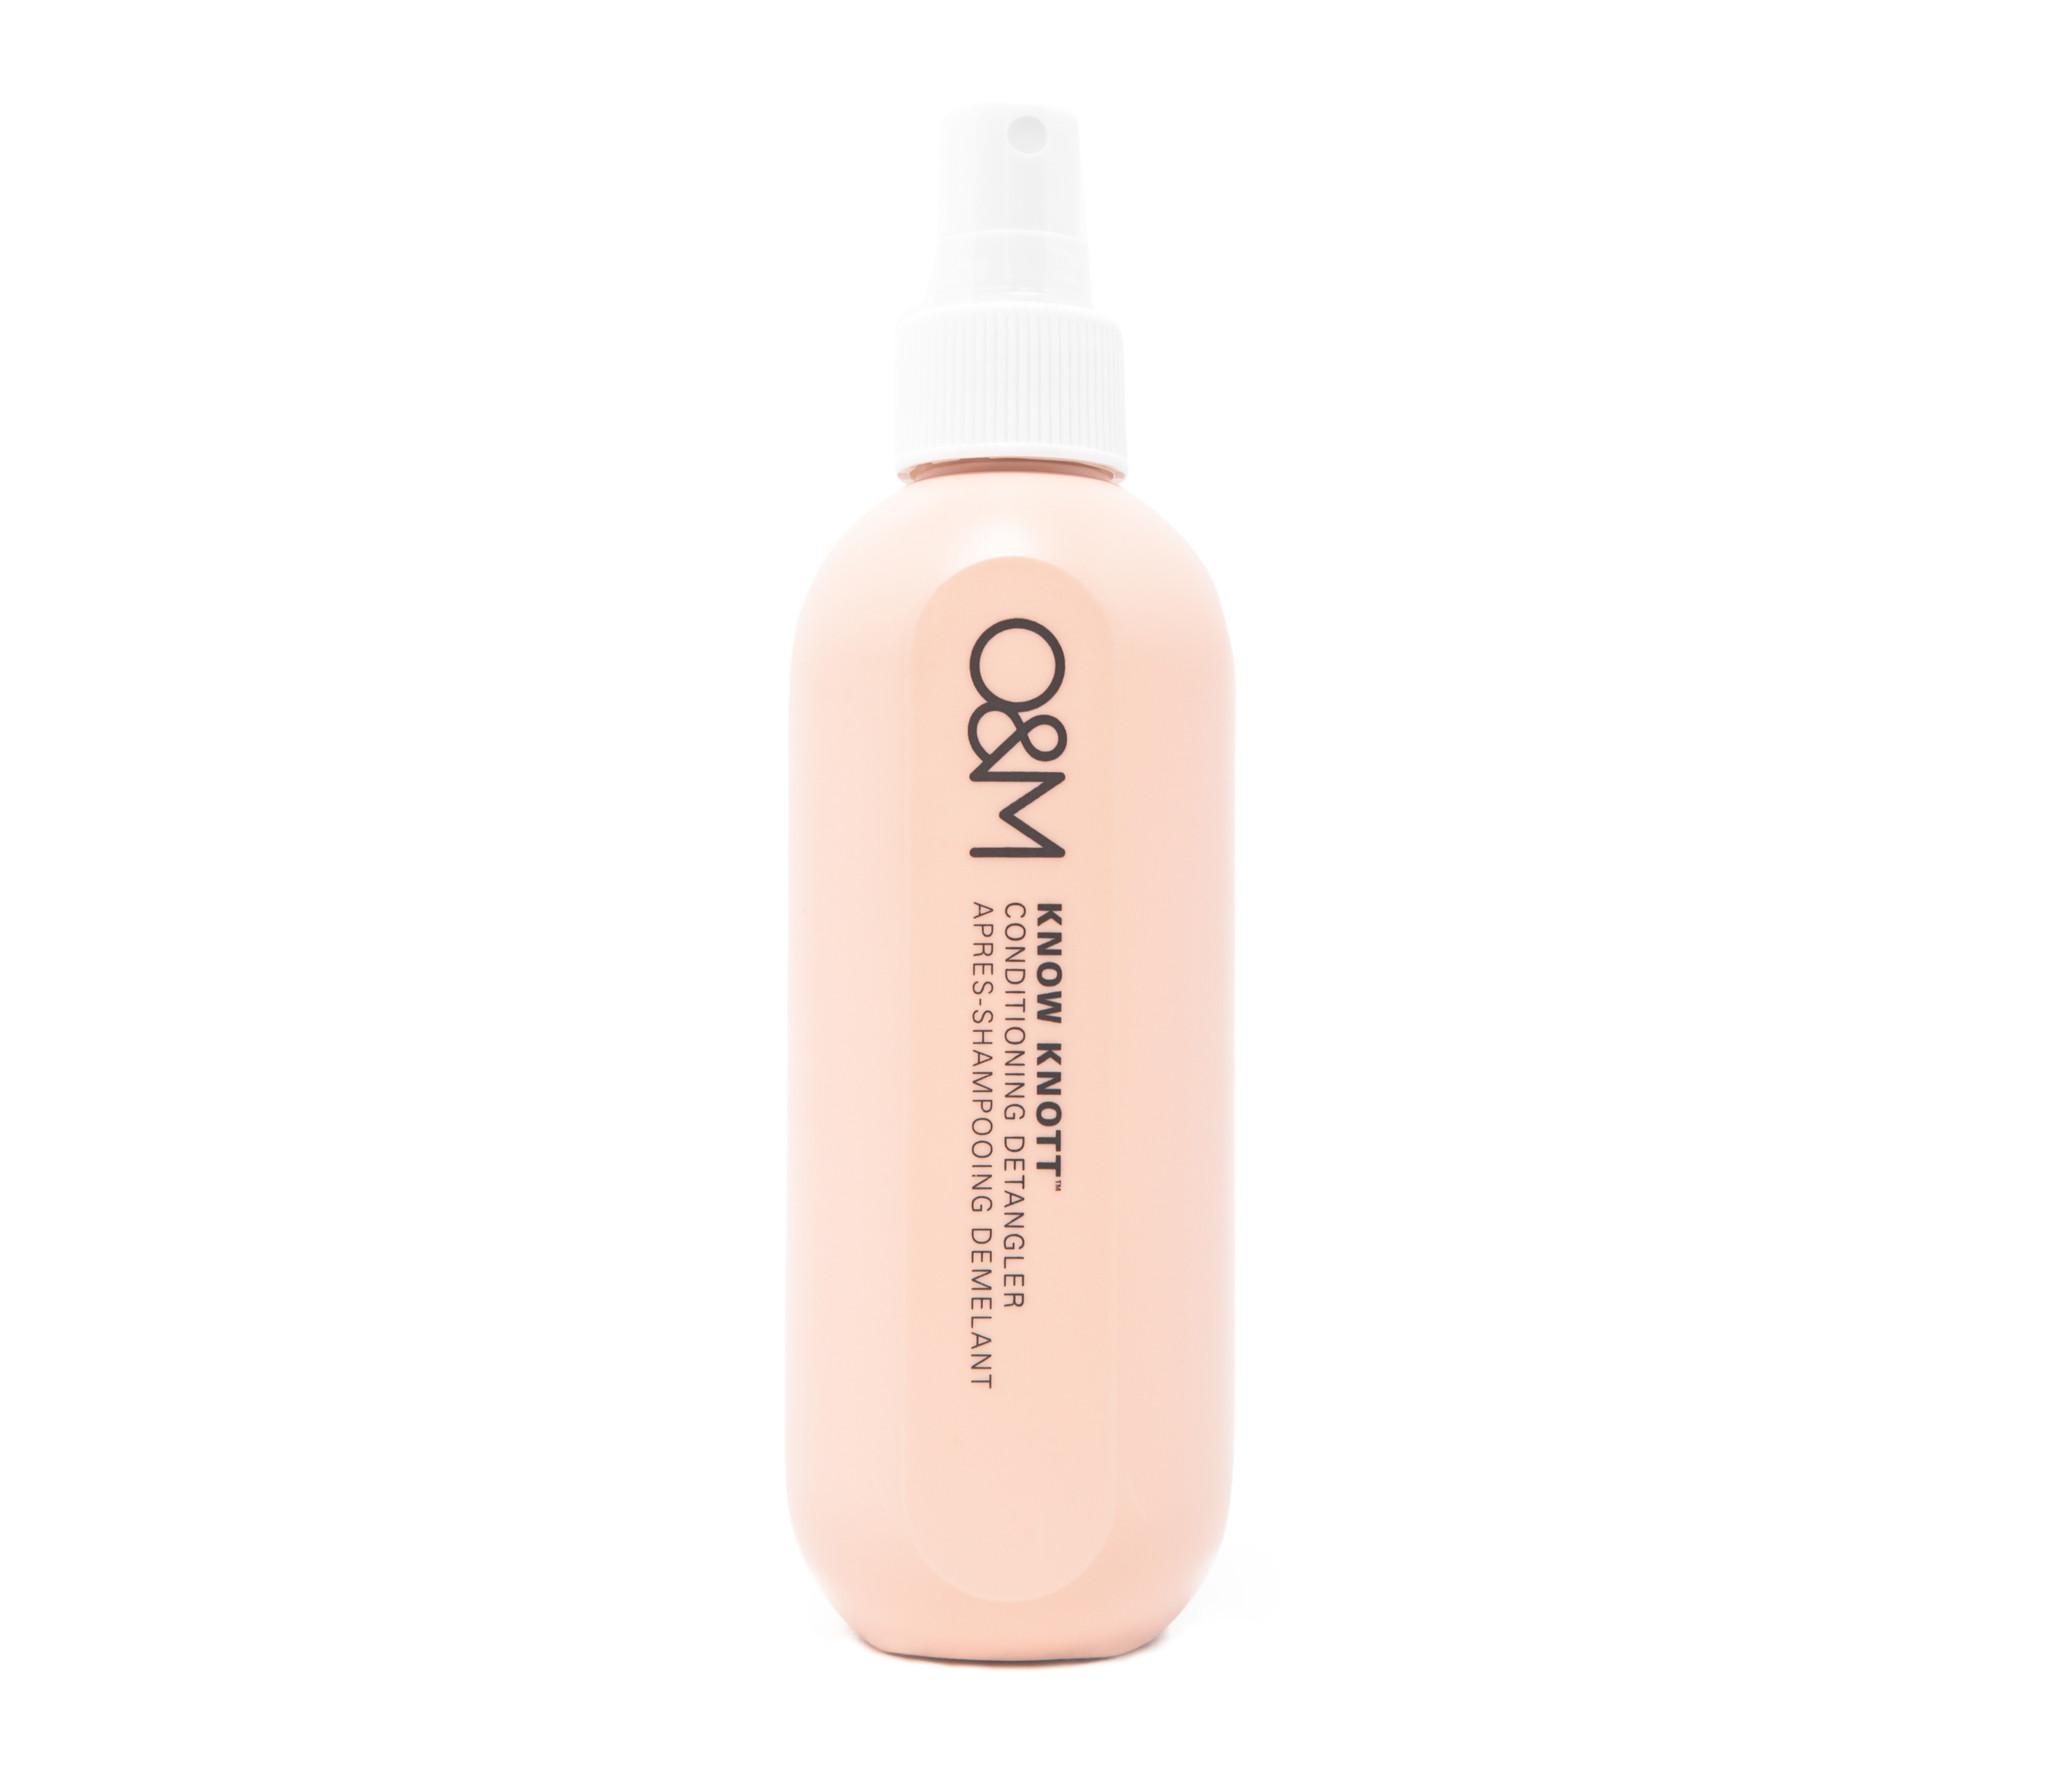 O&M - Original Mineral O&M Know Knott Conditioning Detangler  - Après-Shampooing démêlant - 250ml